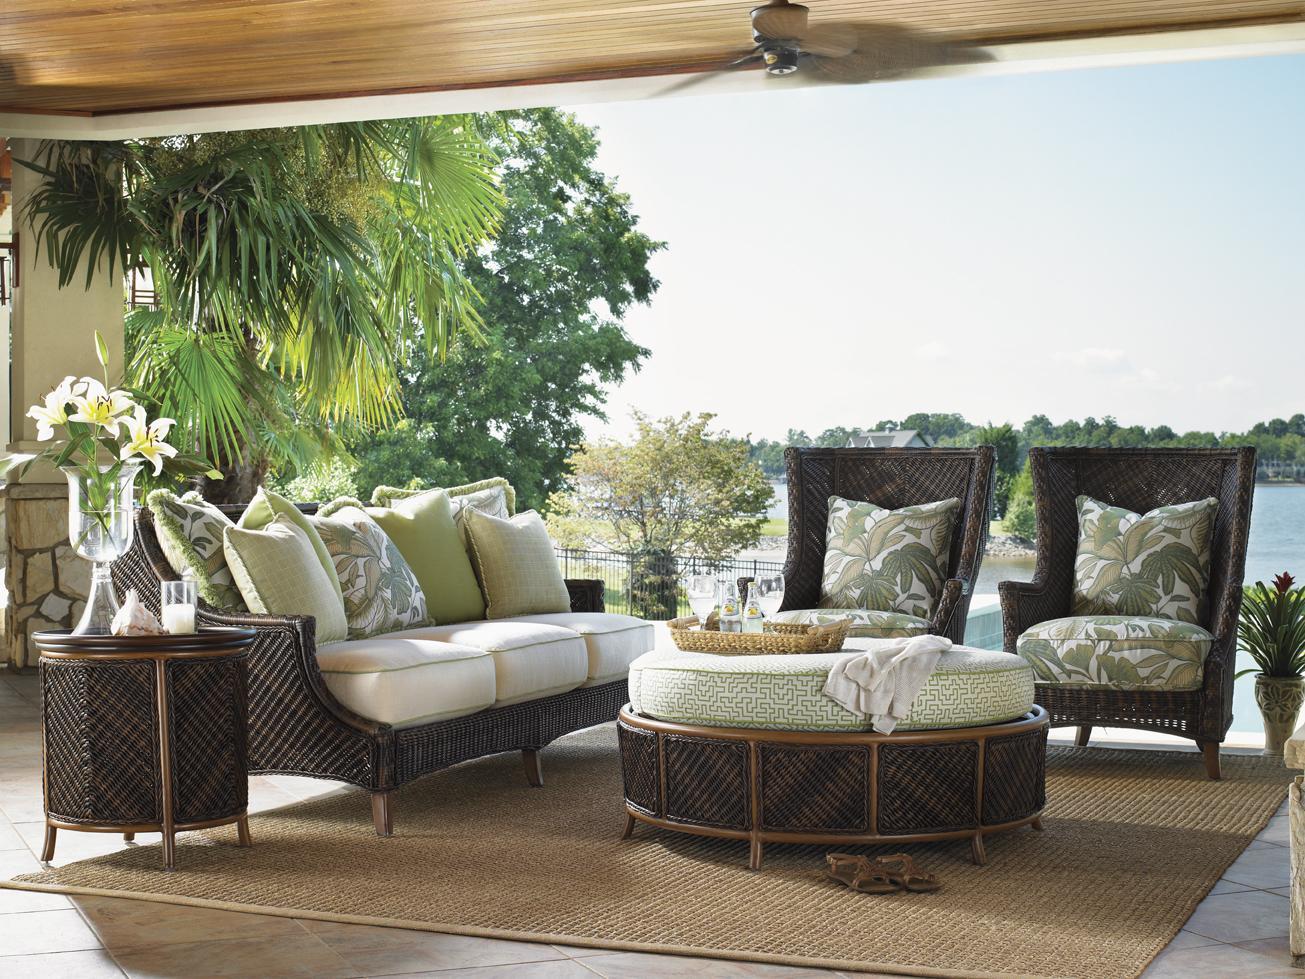 island estate lanai 3170 by tommy bahama outdoor living baer 39 s furniture tommy bahama. Black Bedroom Furniture Sets. Home Design Ideas